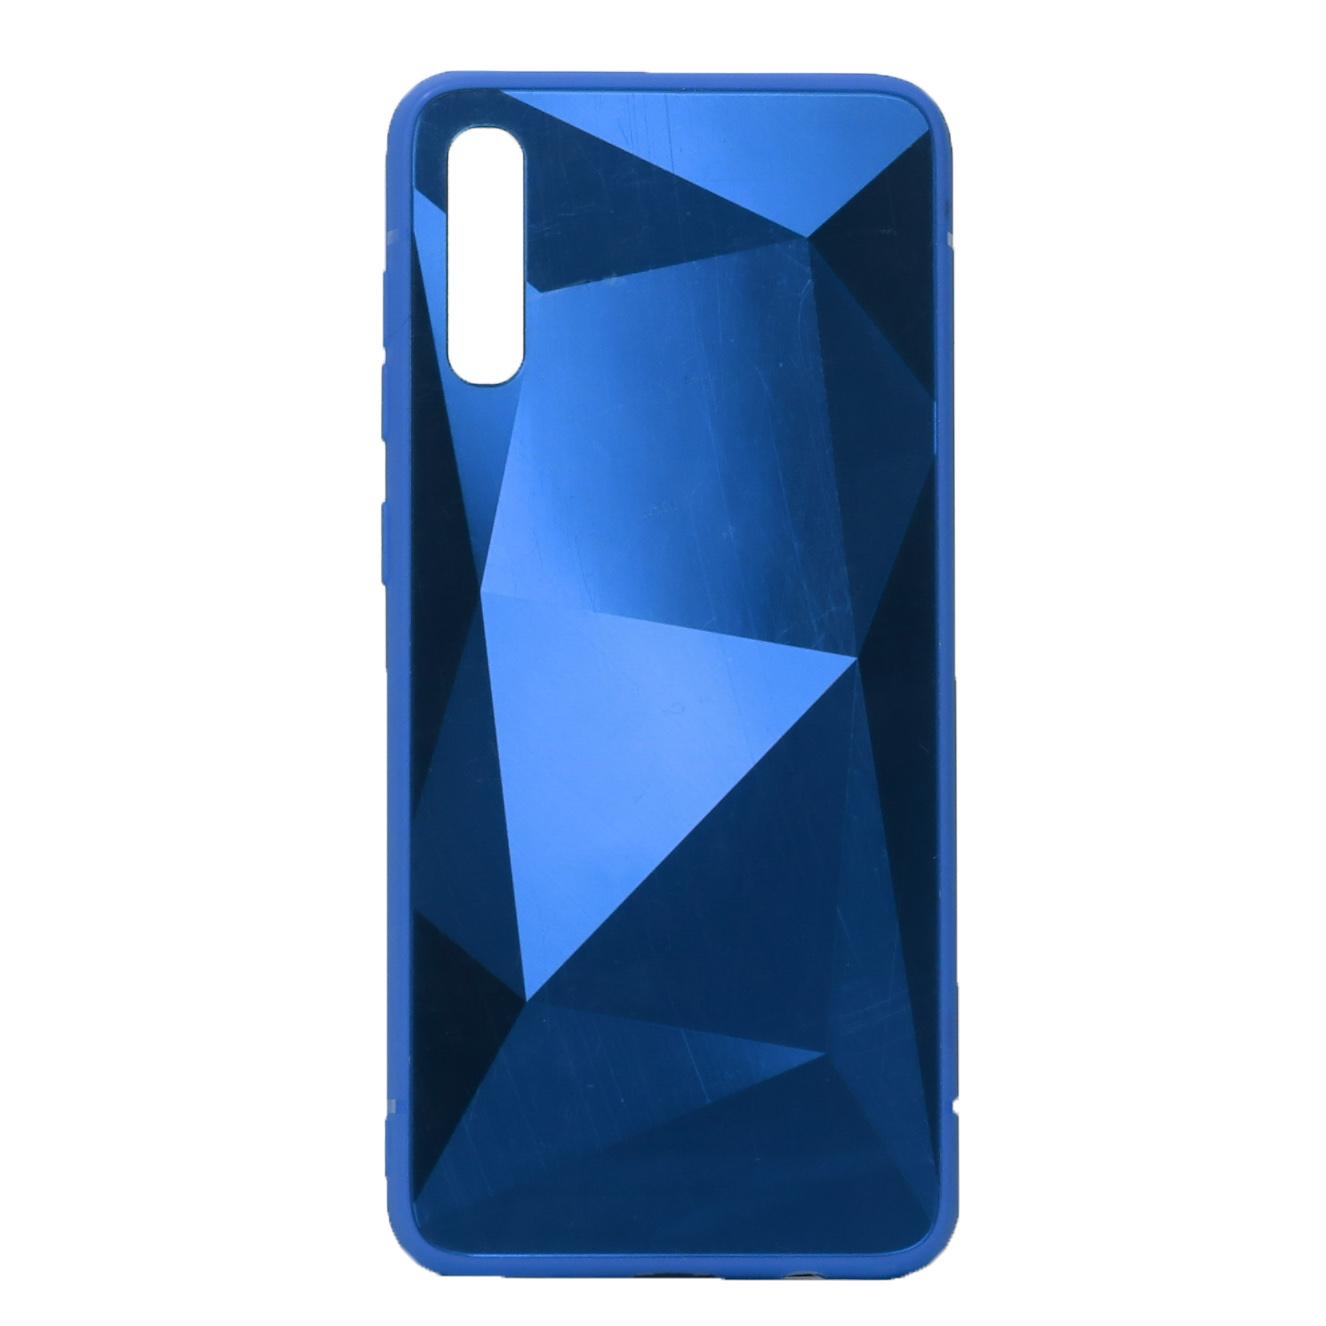 بهترین کاور گوشی موبایل سامسونگ گلکسی y A50/A50s/a30s